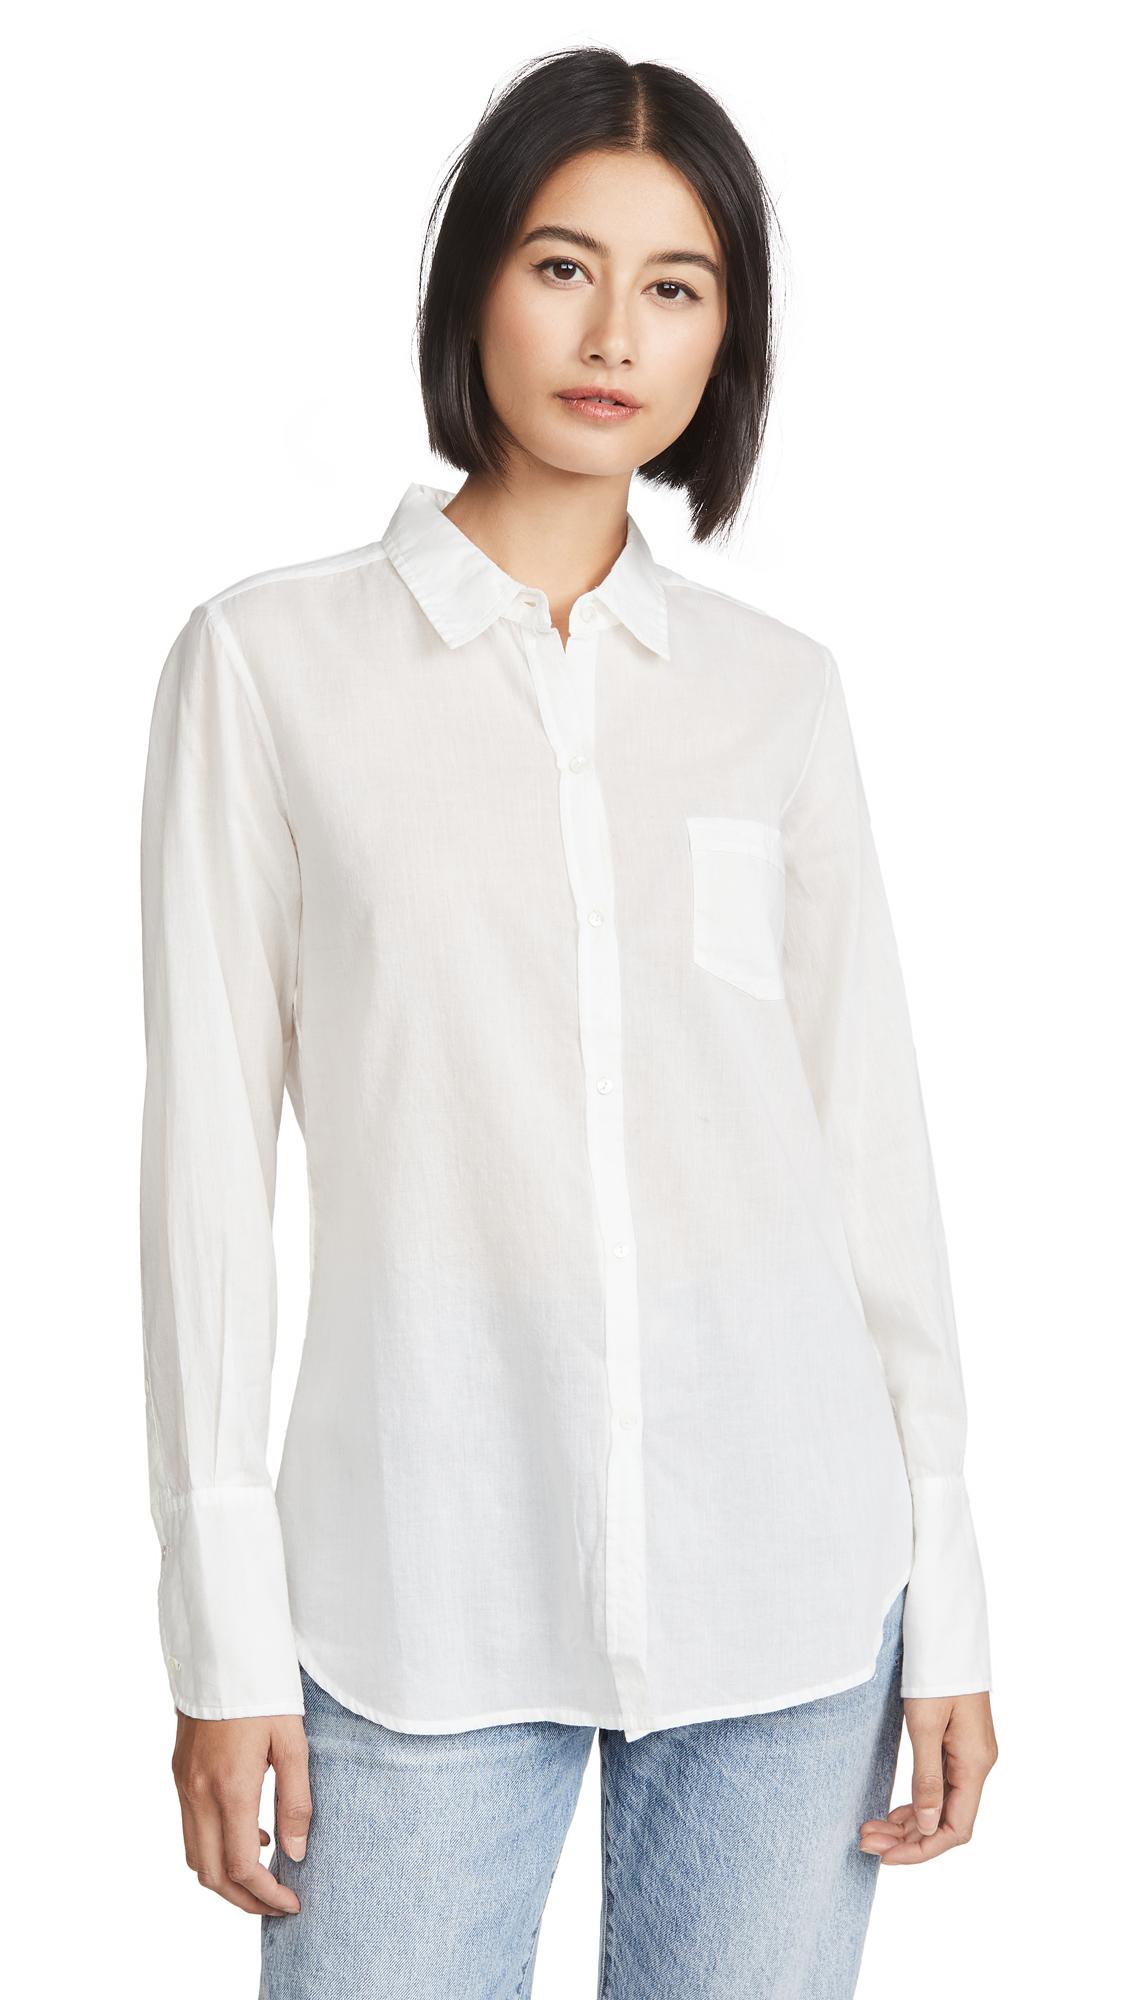 Nili Lotan Cotton Voile Shirt